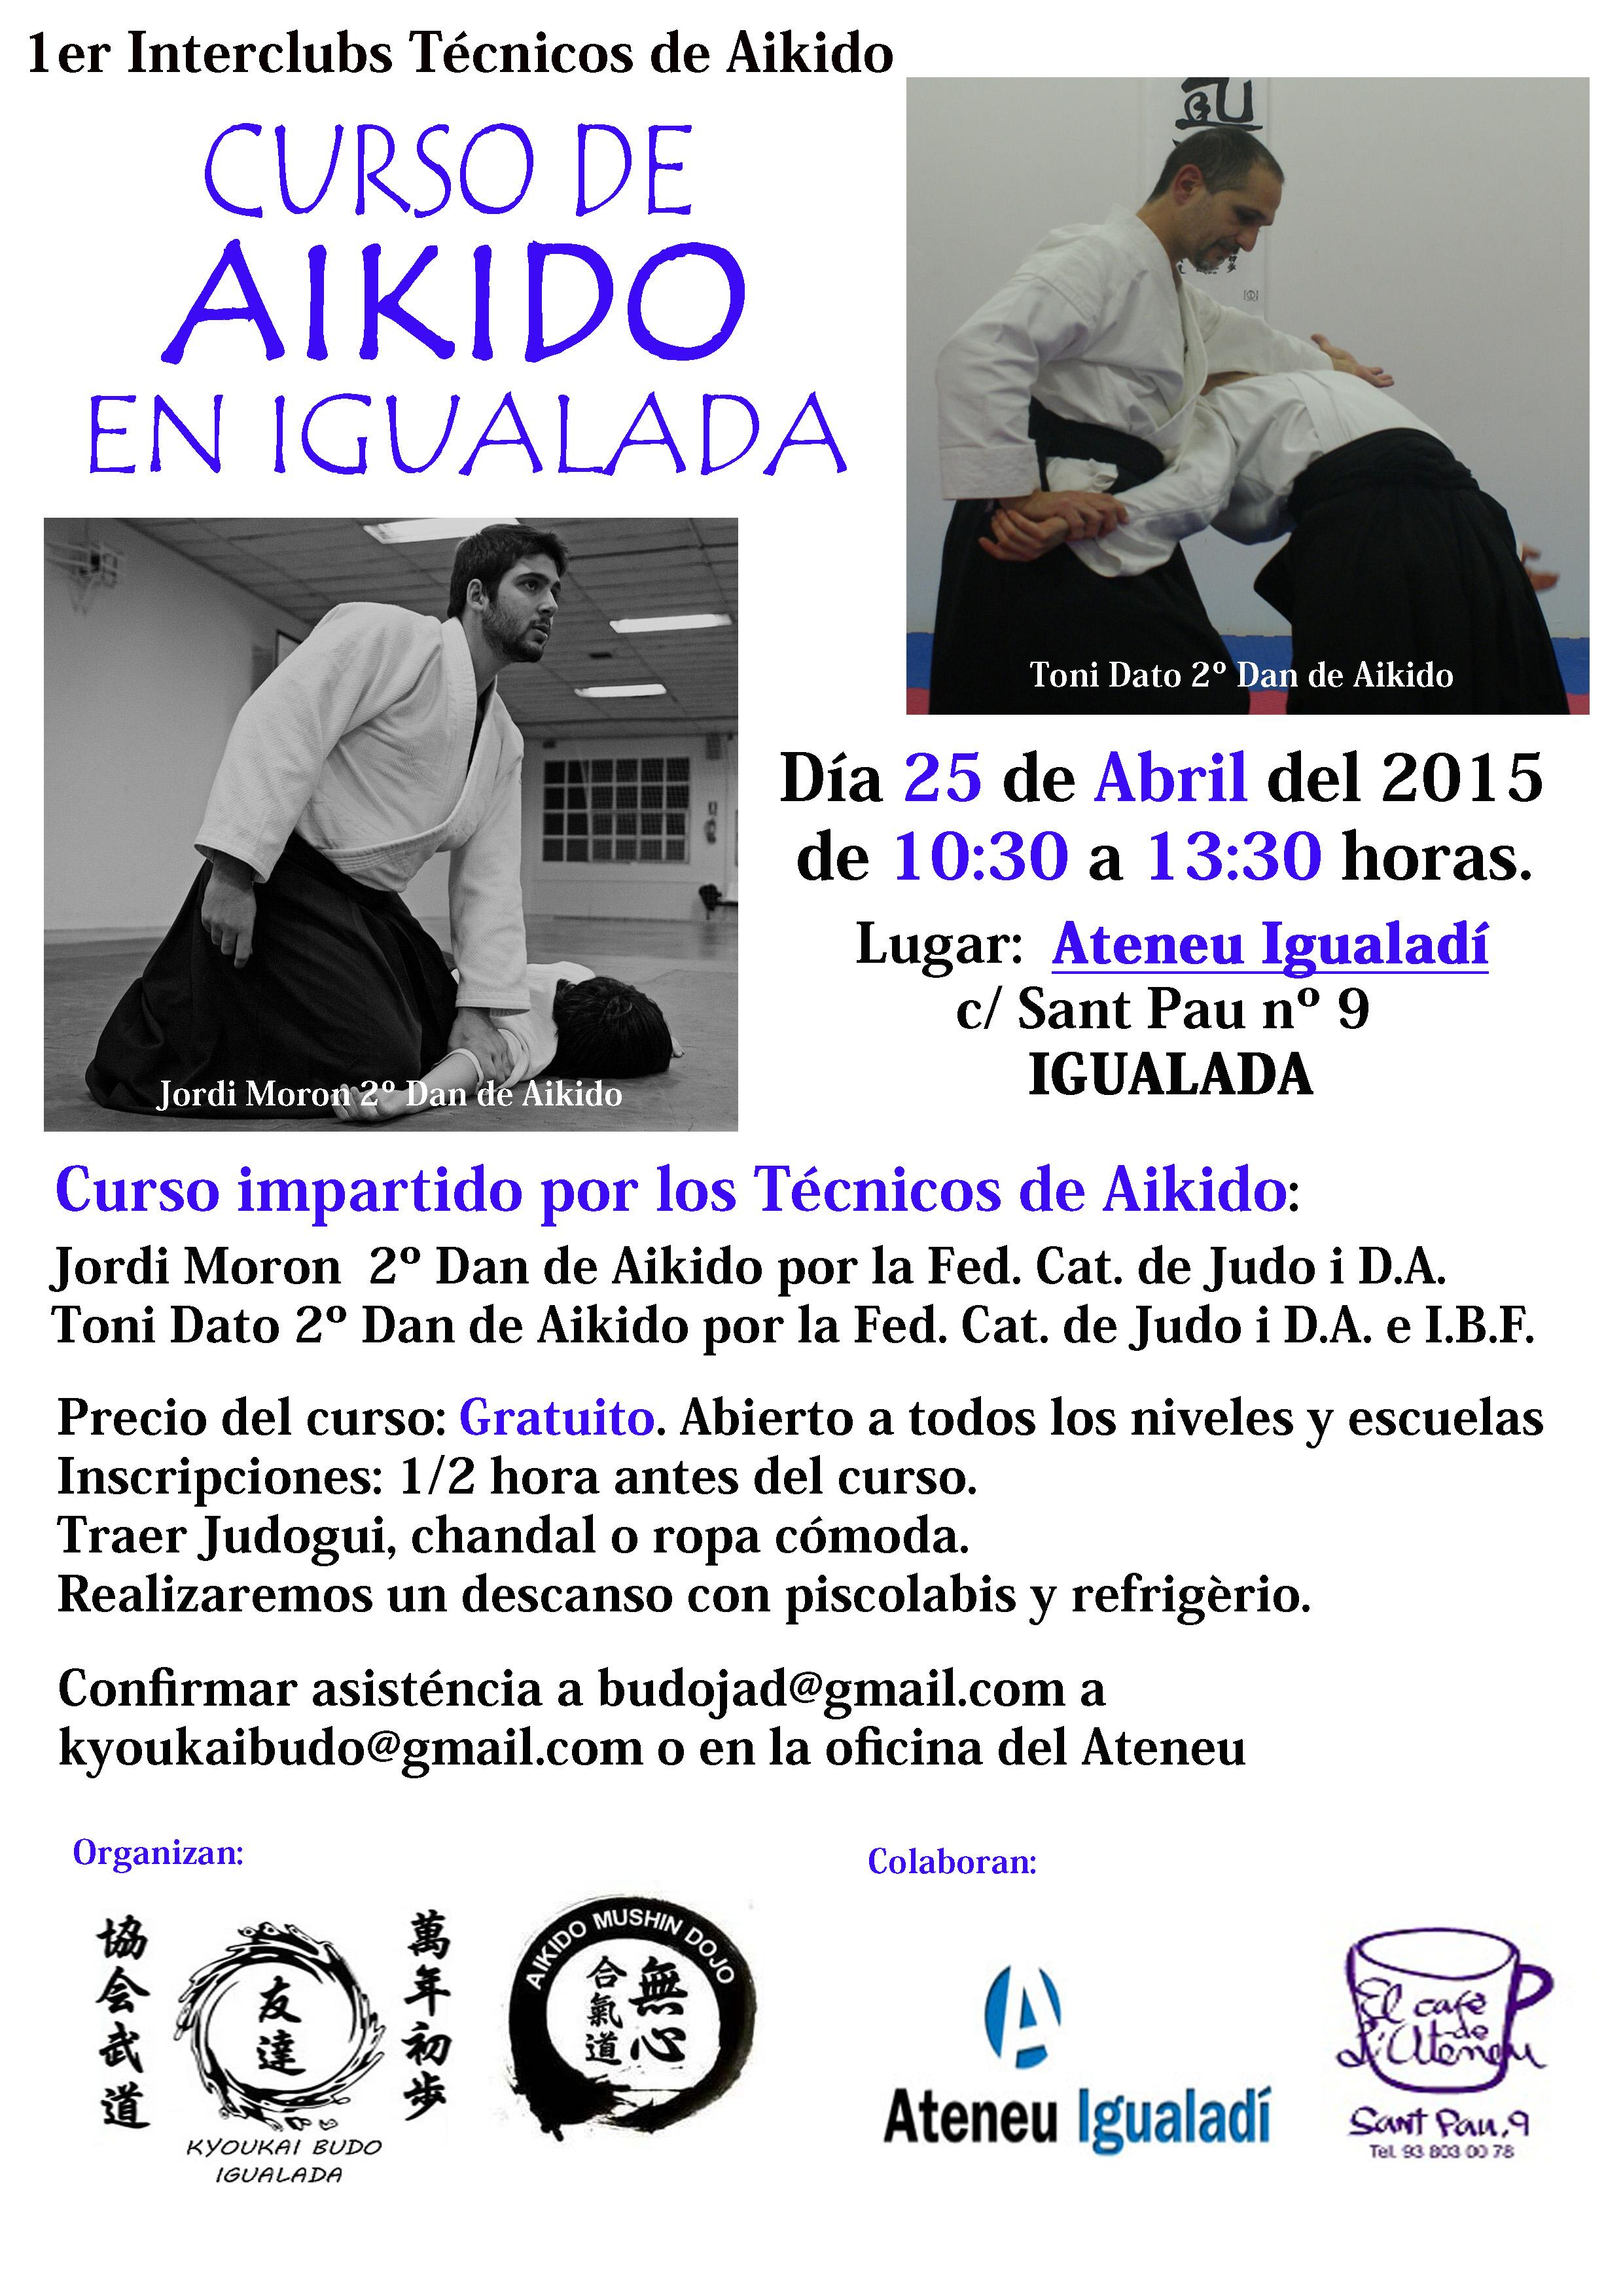 Curso Aikido Igualada 2012-1 copia